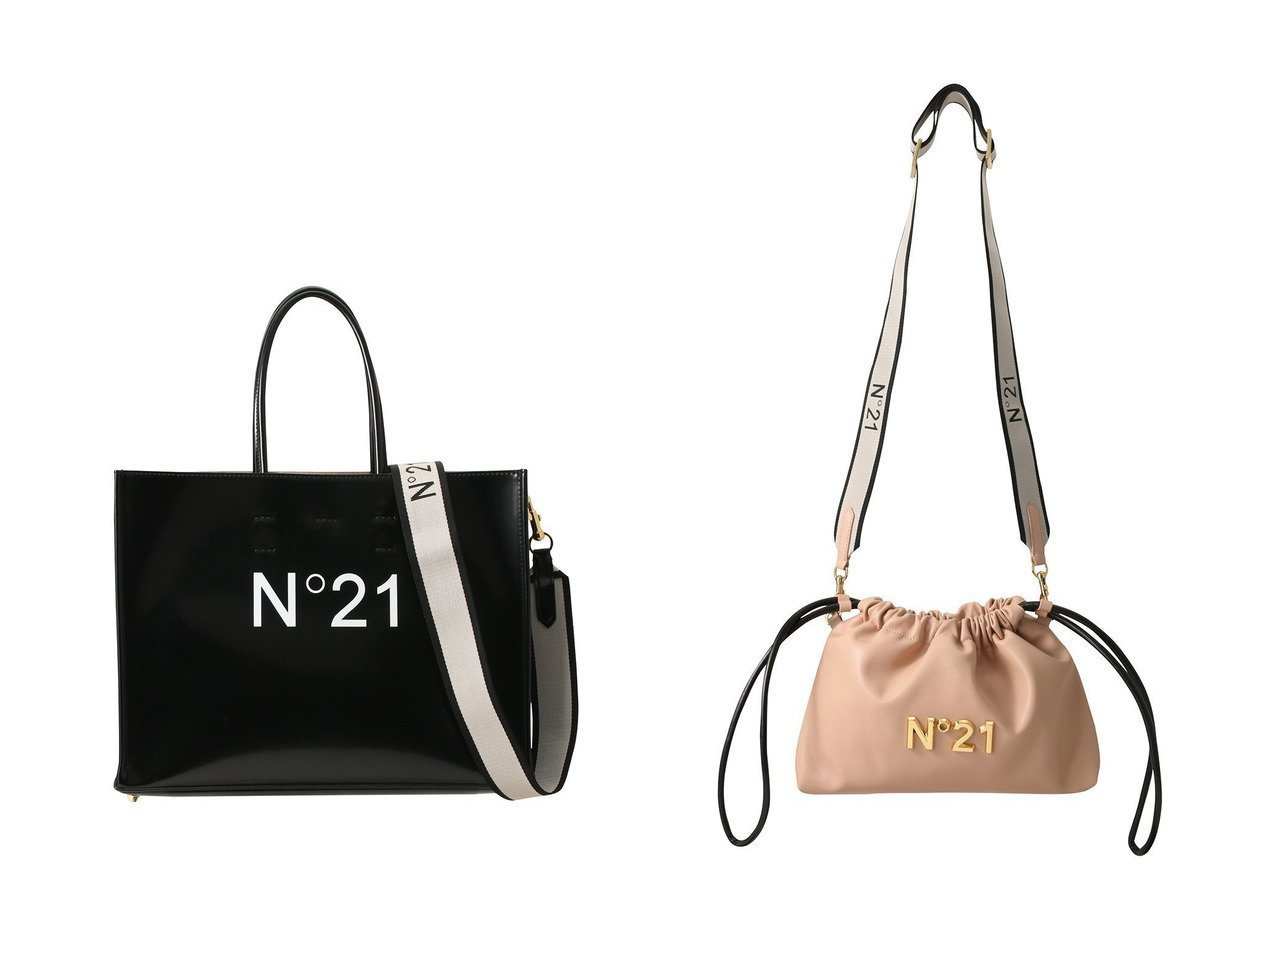 【N°21/ヌメロ ヴェントゥーノ】のCoulisse Eva バッグ&ロゴショッピングショルダーバッグ N°21 ヌメロ ヴェントゥーノのおすすめ!人気、トレンド・レディースファッションの通販 おすすめで人気の流行・トレンド、ファッションの通販商品 メンズファッション・キッズファッション・インテリア・家具・レディースファッション・服の通販 founy(ファニー) https://founy.com/ ファッション Fashion レディースファッション WOMEN バッグ Bag 2021年 2021 2021 春夏 S/S SS Spring/Summer 2021 S/S 春夏 SS Spring/Summer シンプル スポーティ メタル 巾着 春 Spring |ID:crp329100000020919